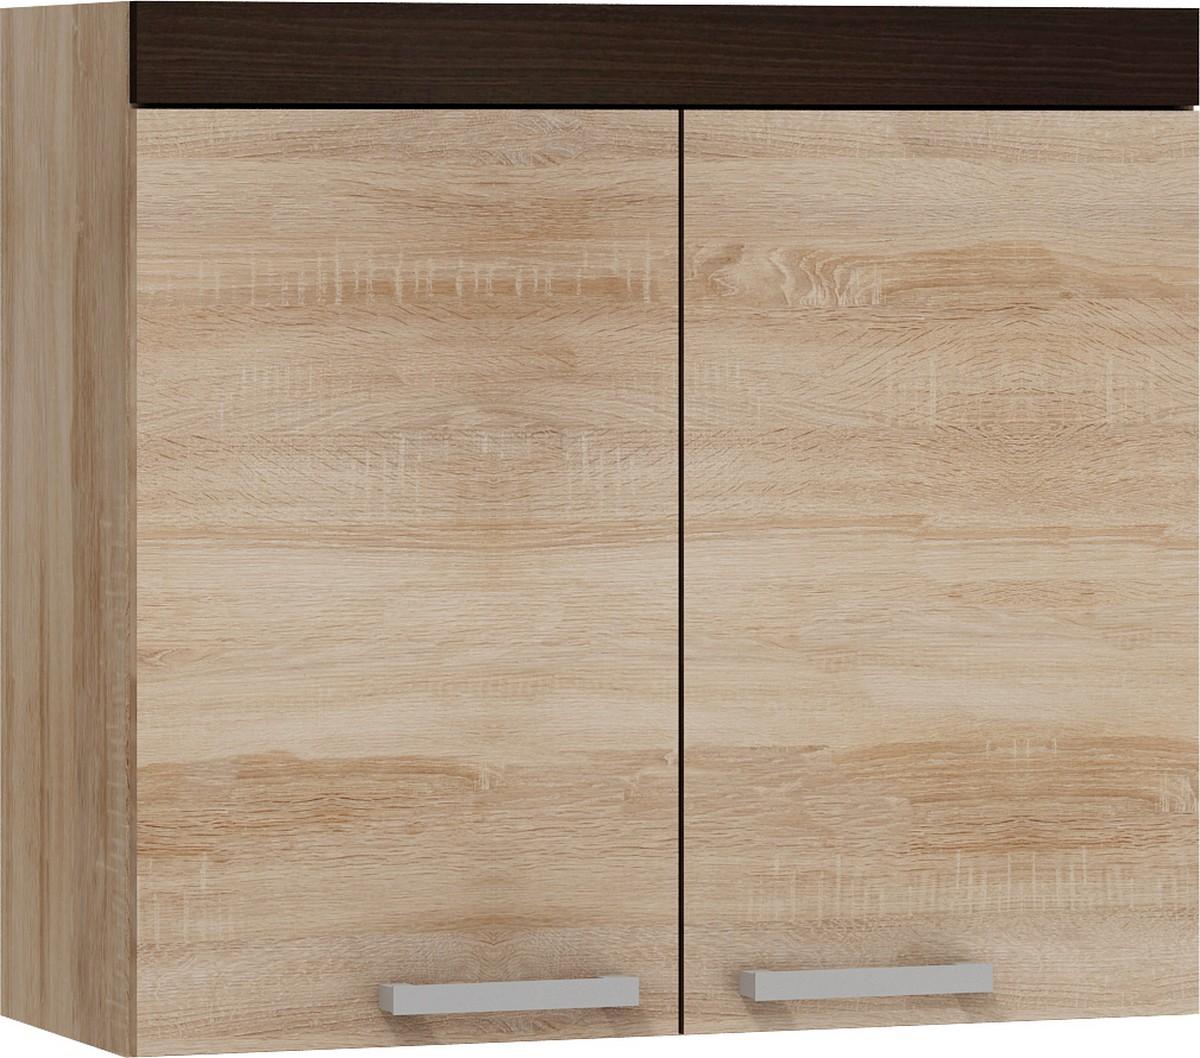 Horní kuchyňská skříňka - WIP - Milo - W80